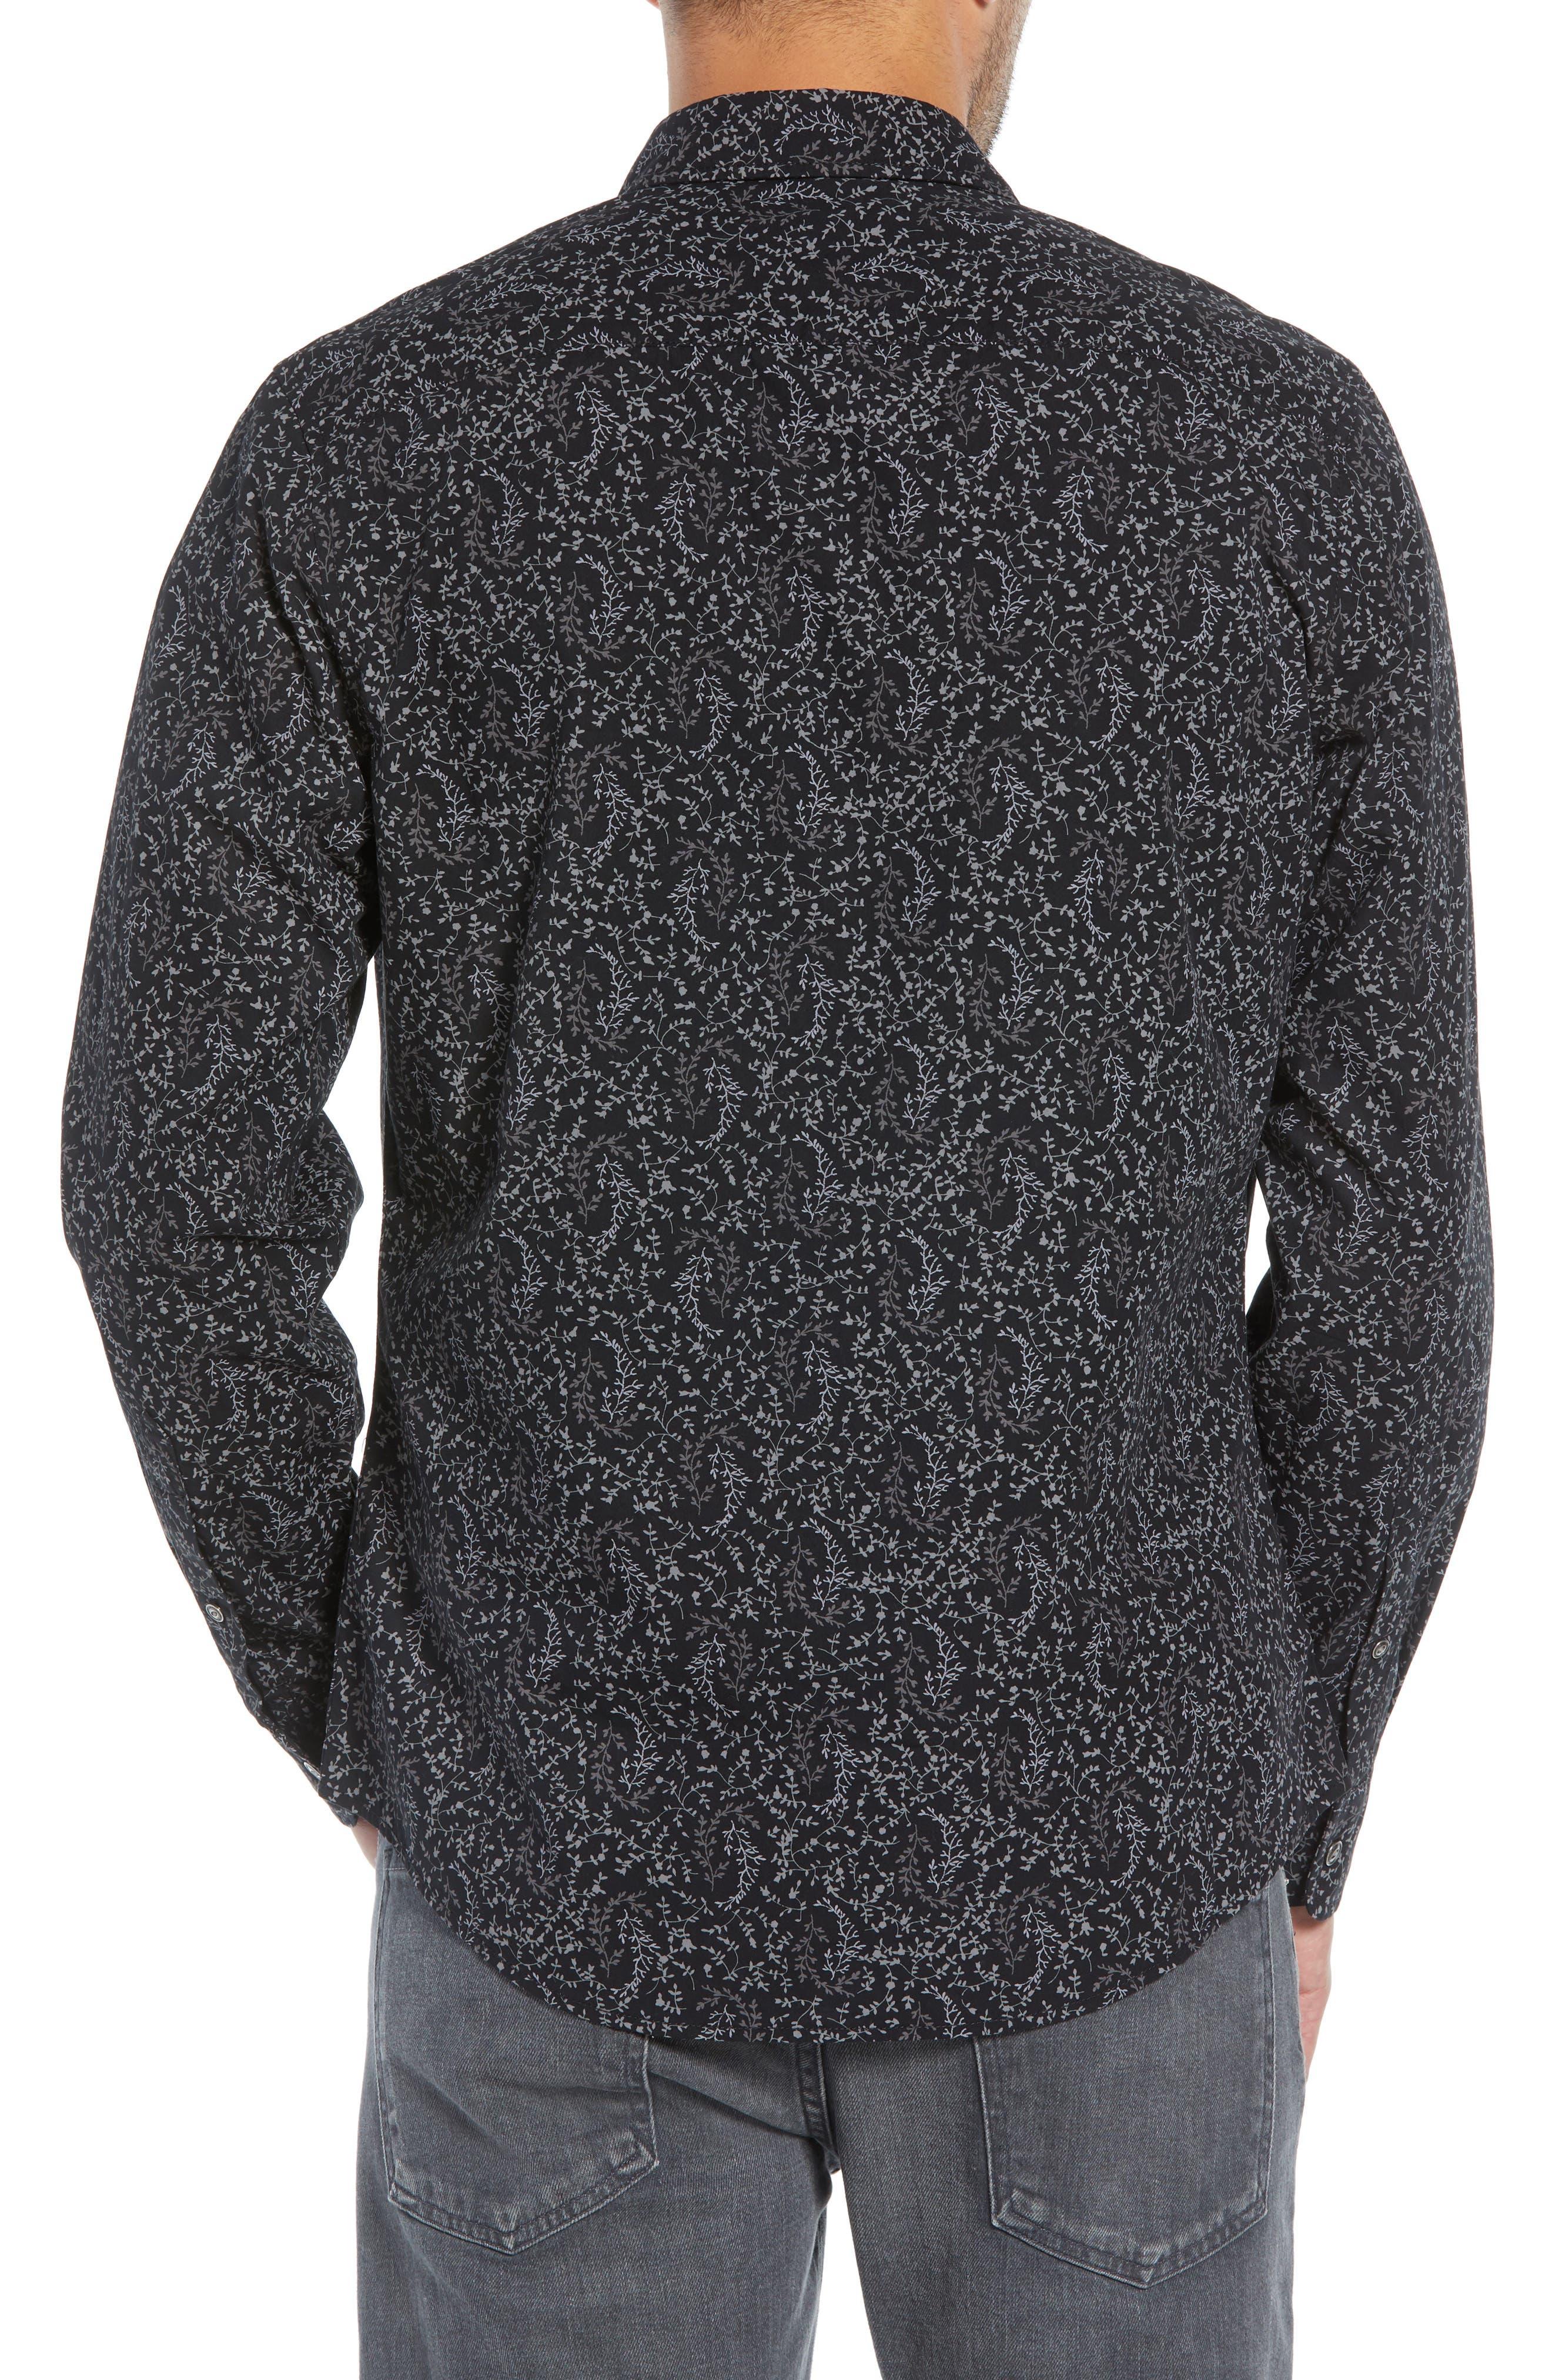 Regular Fit Print Sport Shirt,                             Alternate thumbnail 2, color,                             BLACK ROCK TUMBLEWEED